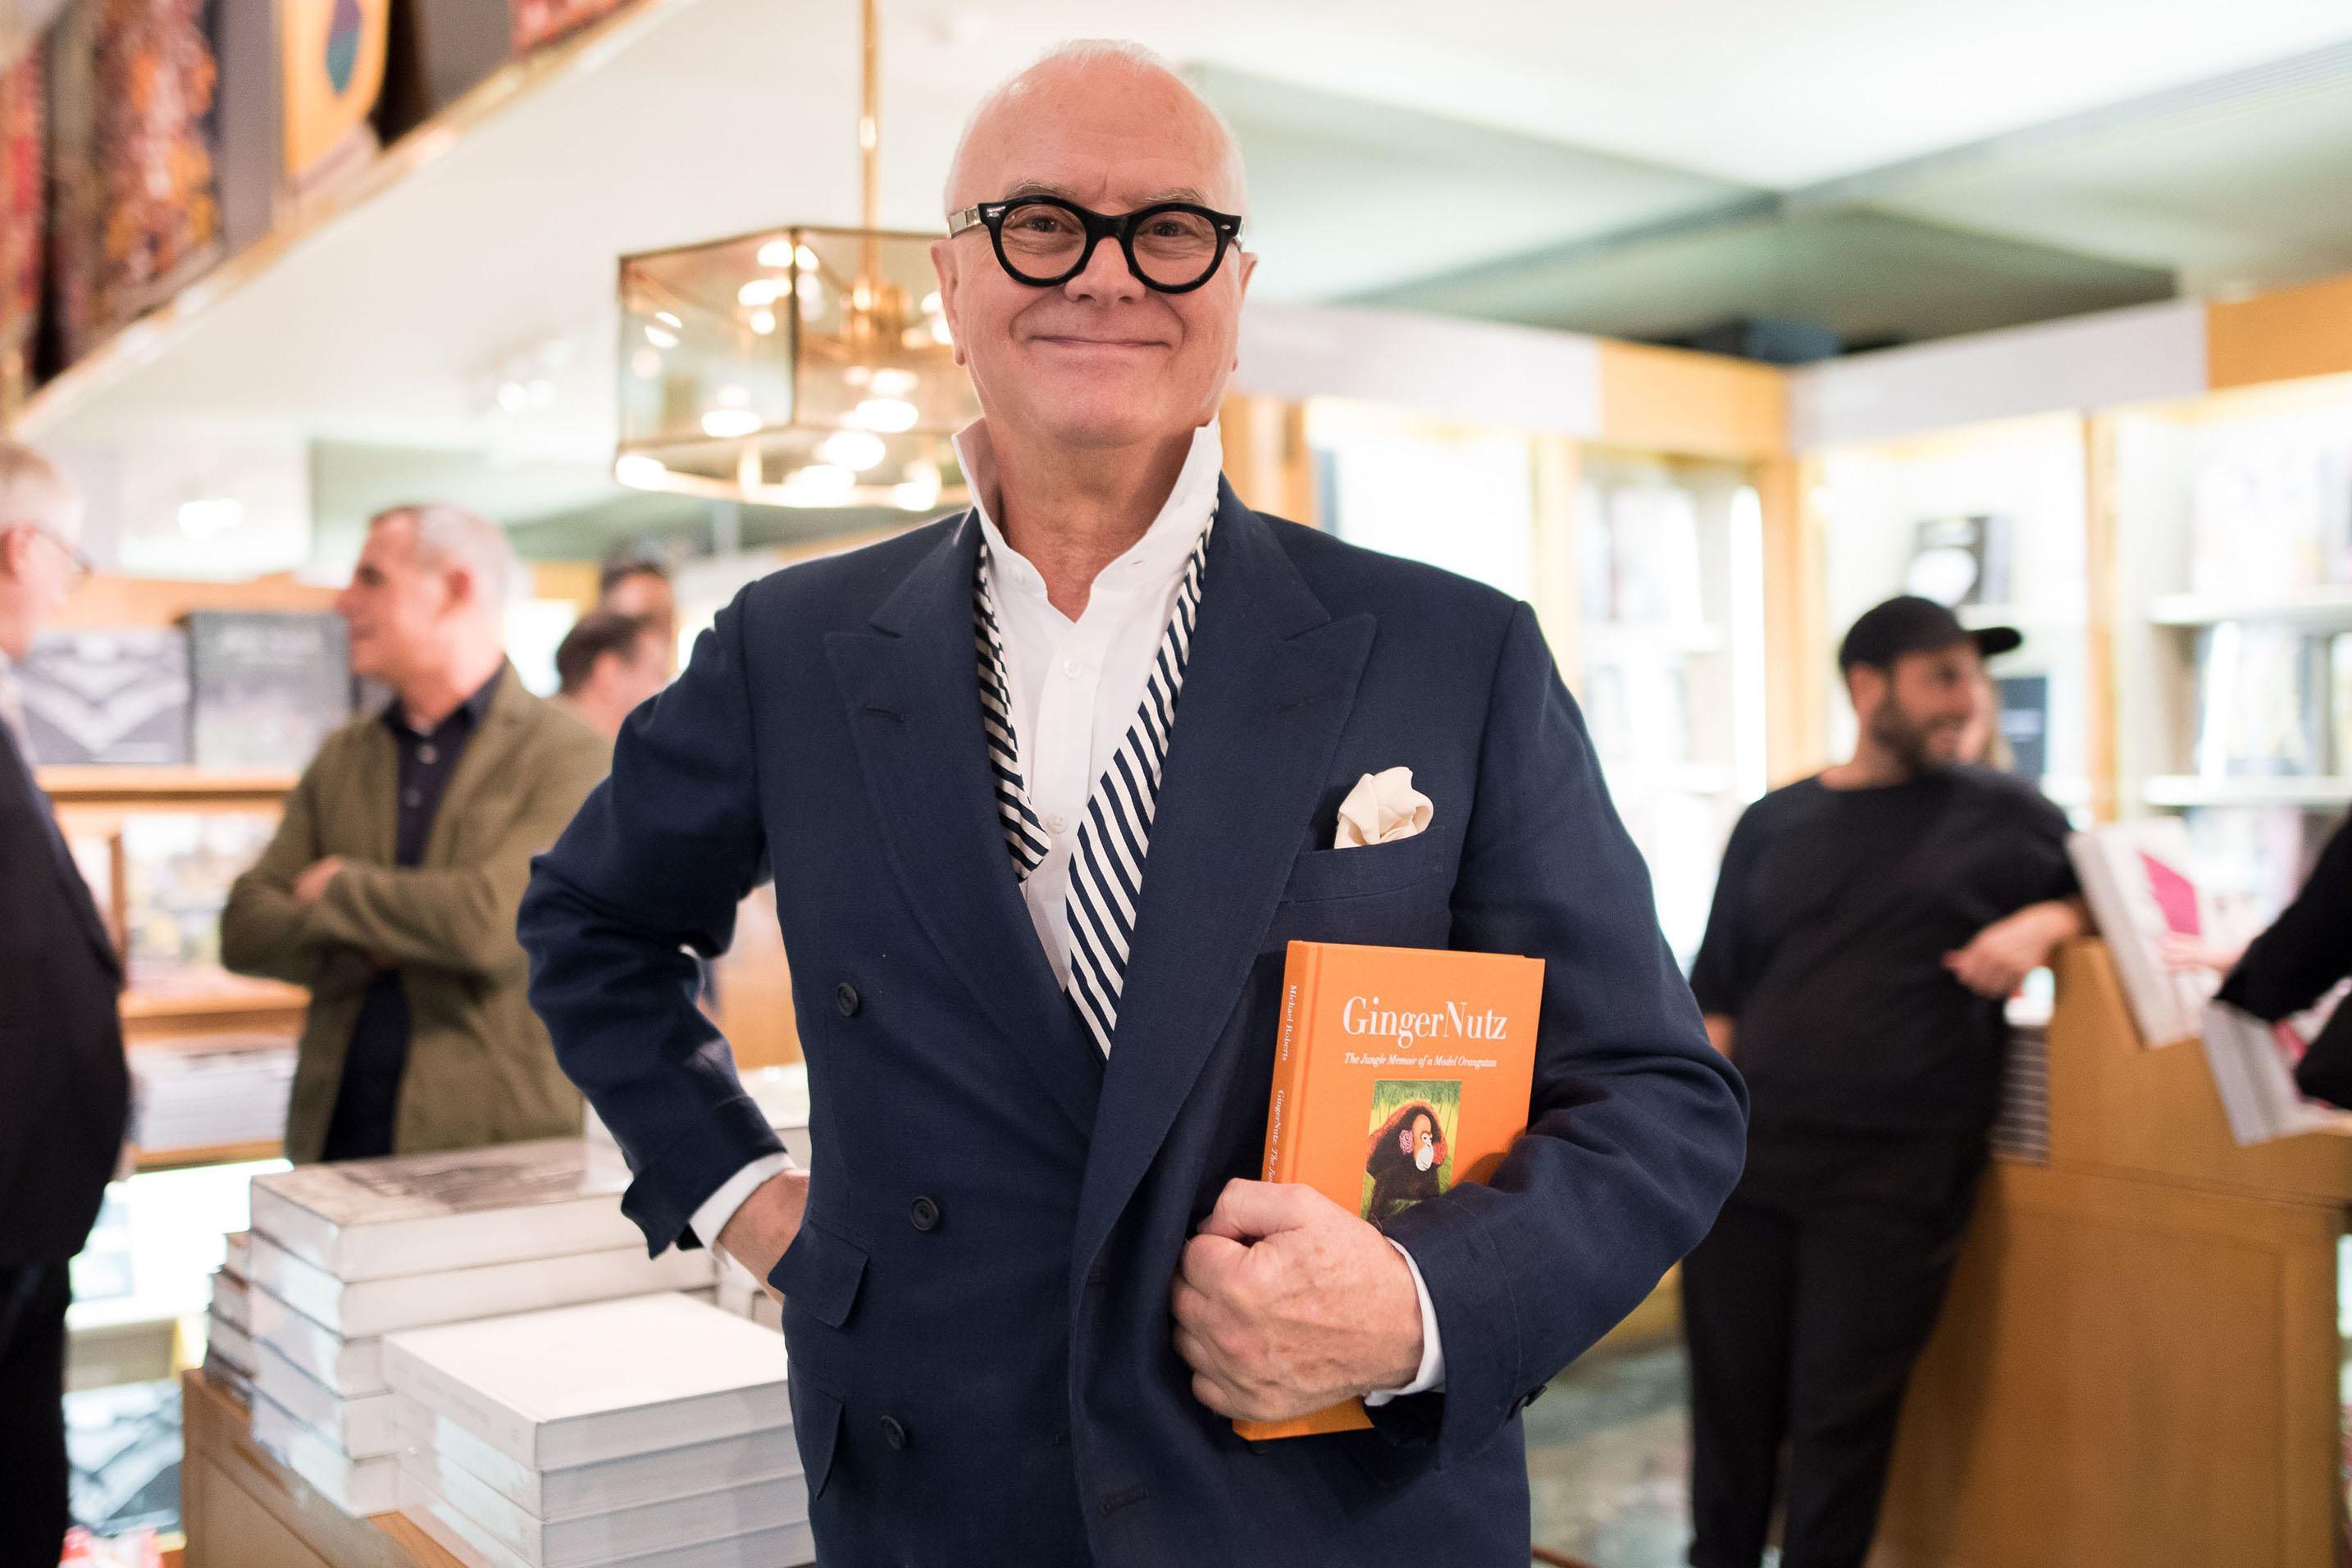 Manolo BlahnikGrace Coddington and Michael Roberts 'GingerNutz' book signing, The Met Store, New York, USA - 08 Sep 2017